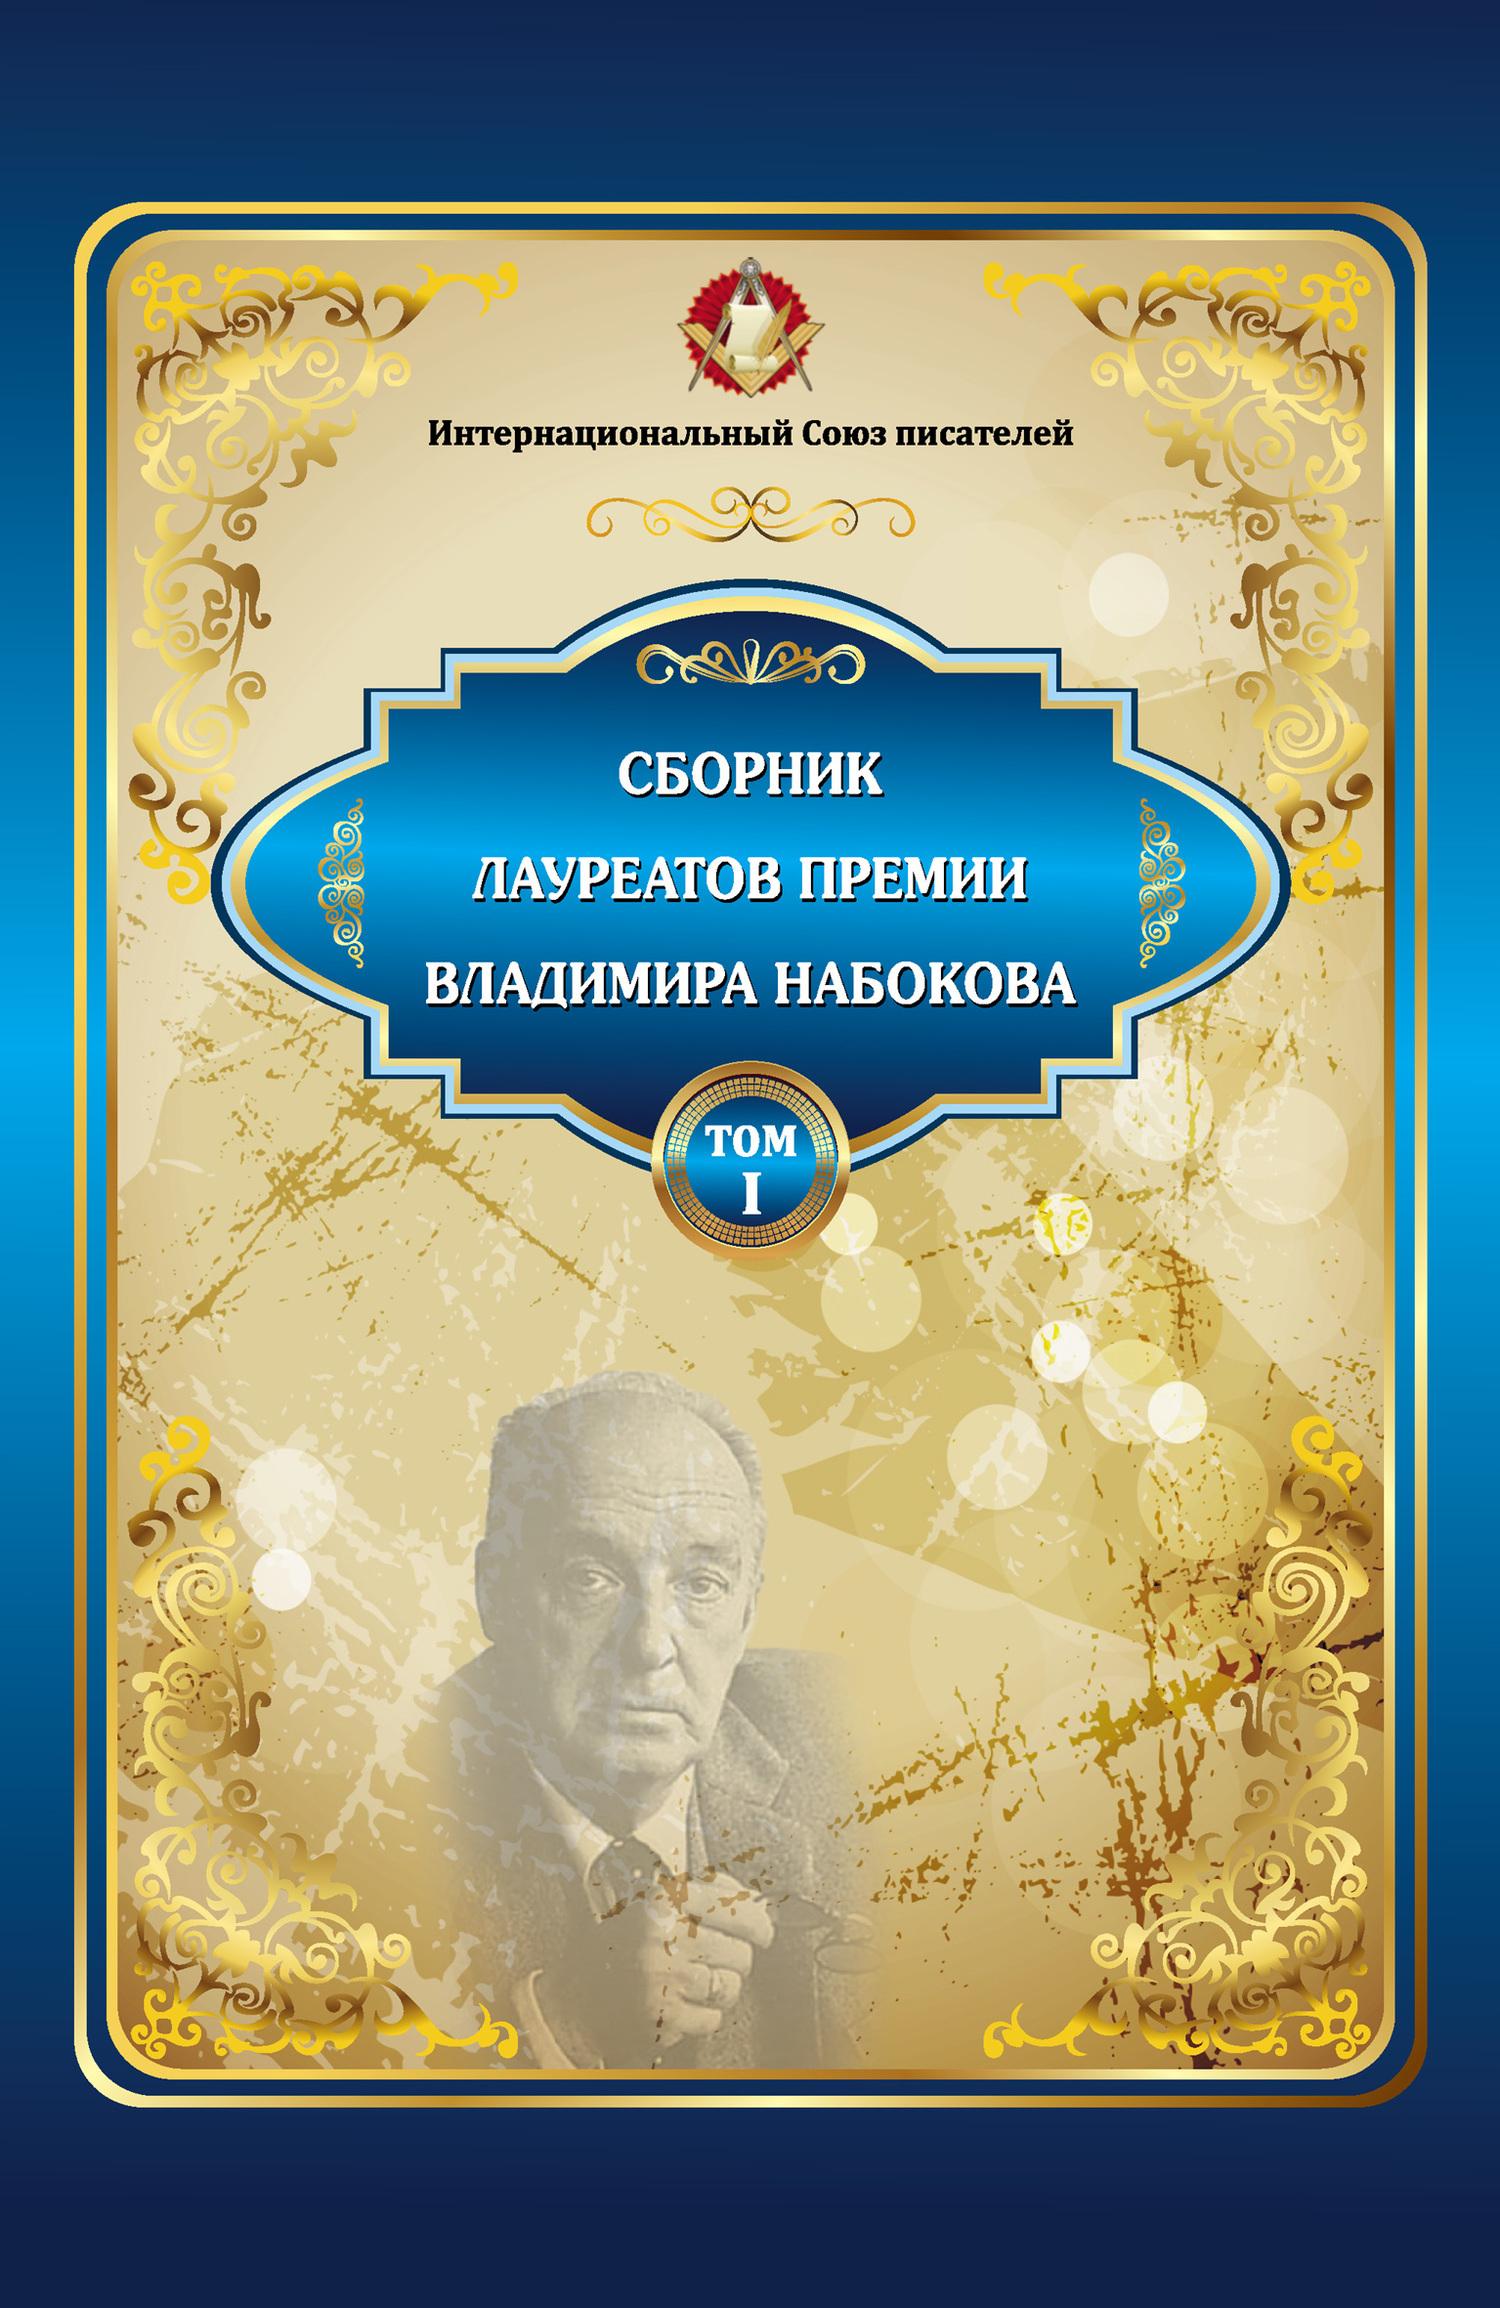 Сборник лауреатов премии Владимира Набокова. Том 1